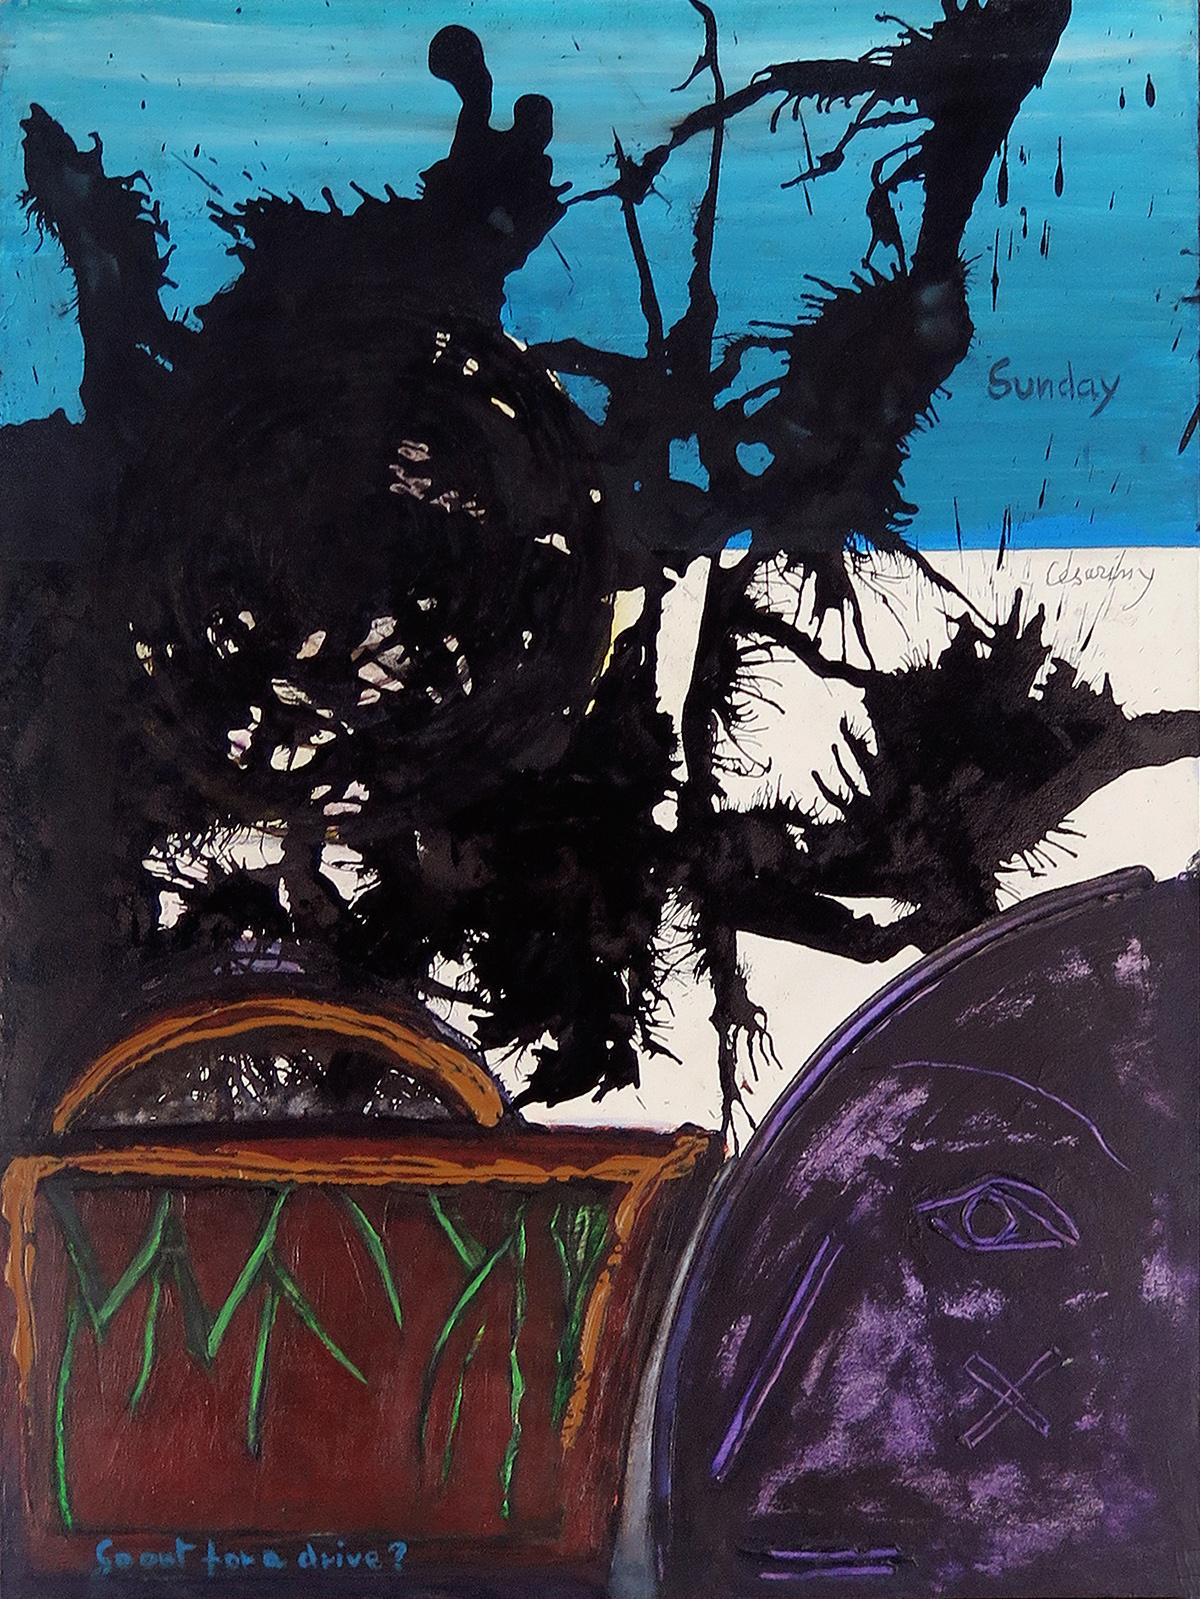 Sunday, So Out for a Drive, acrilico sobre madeira, 56 x 41,5 cm